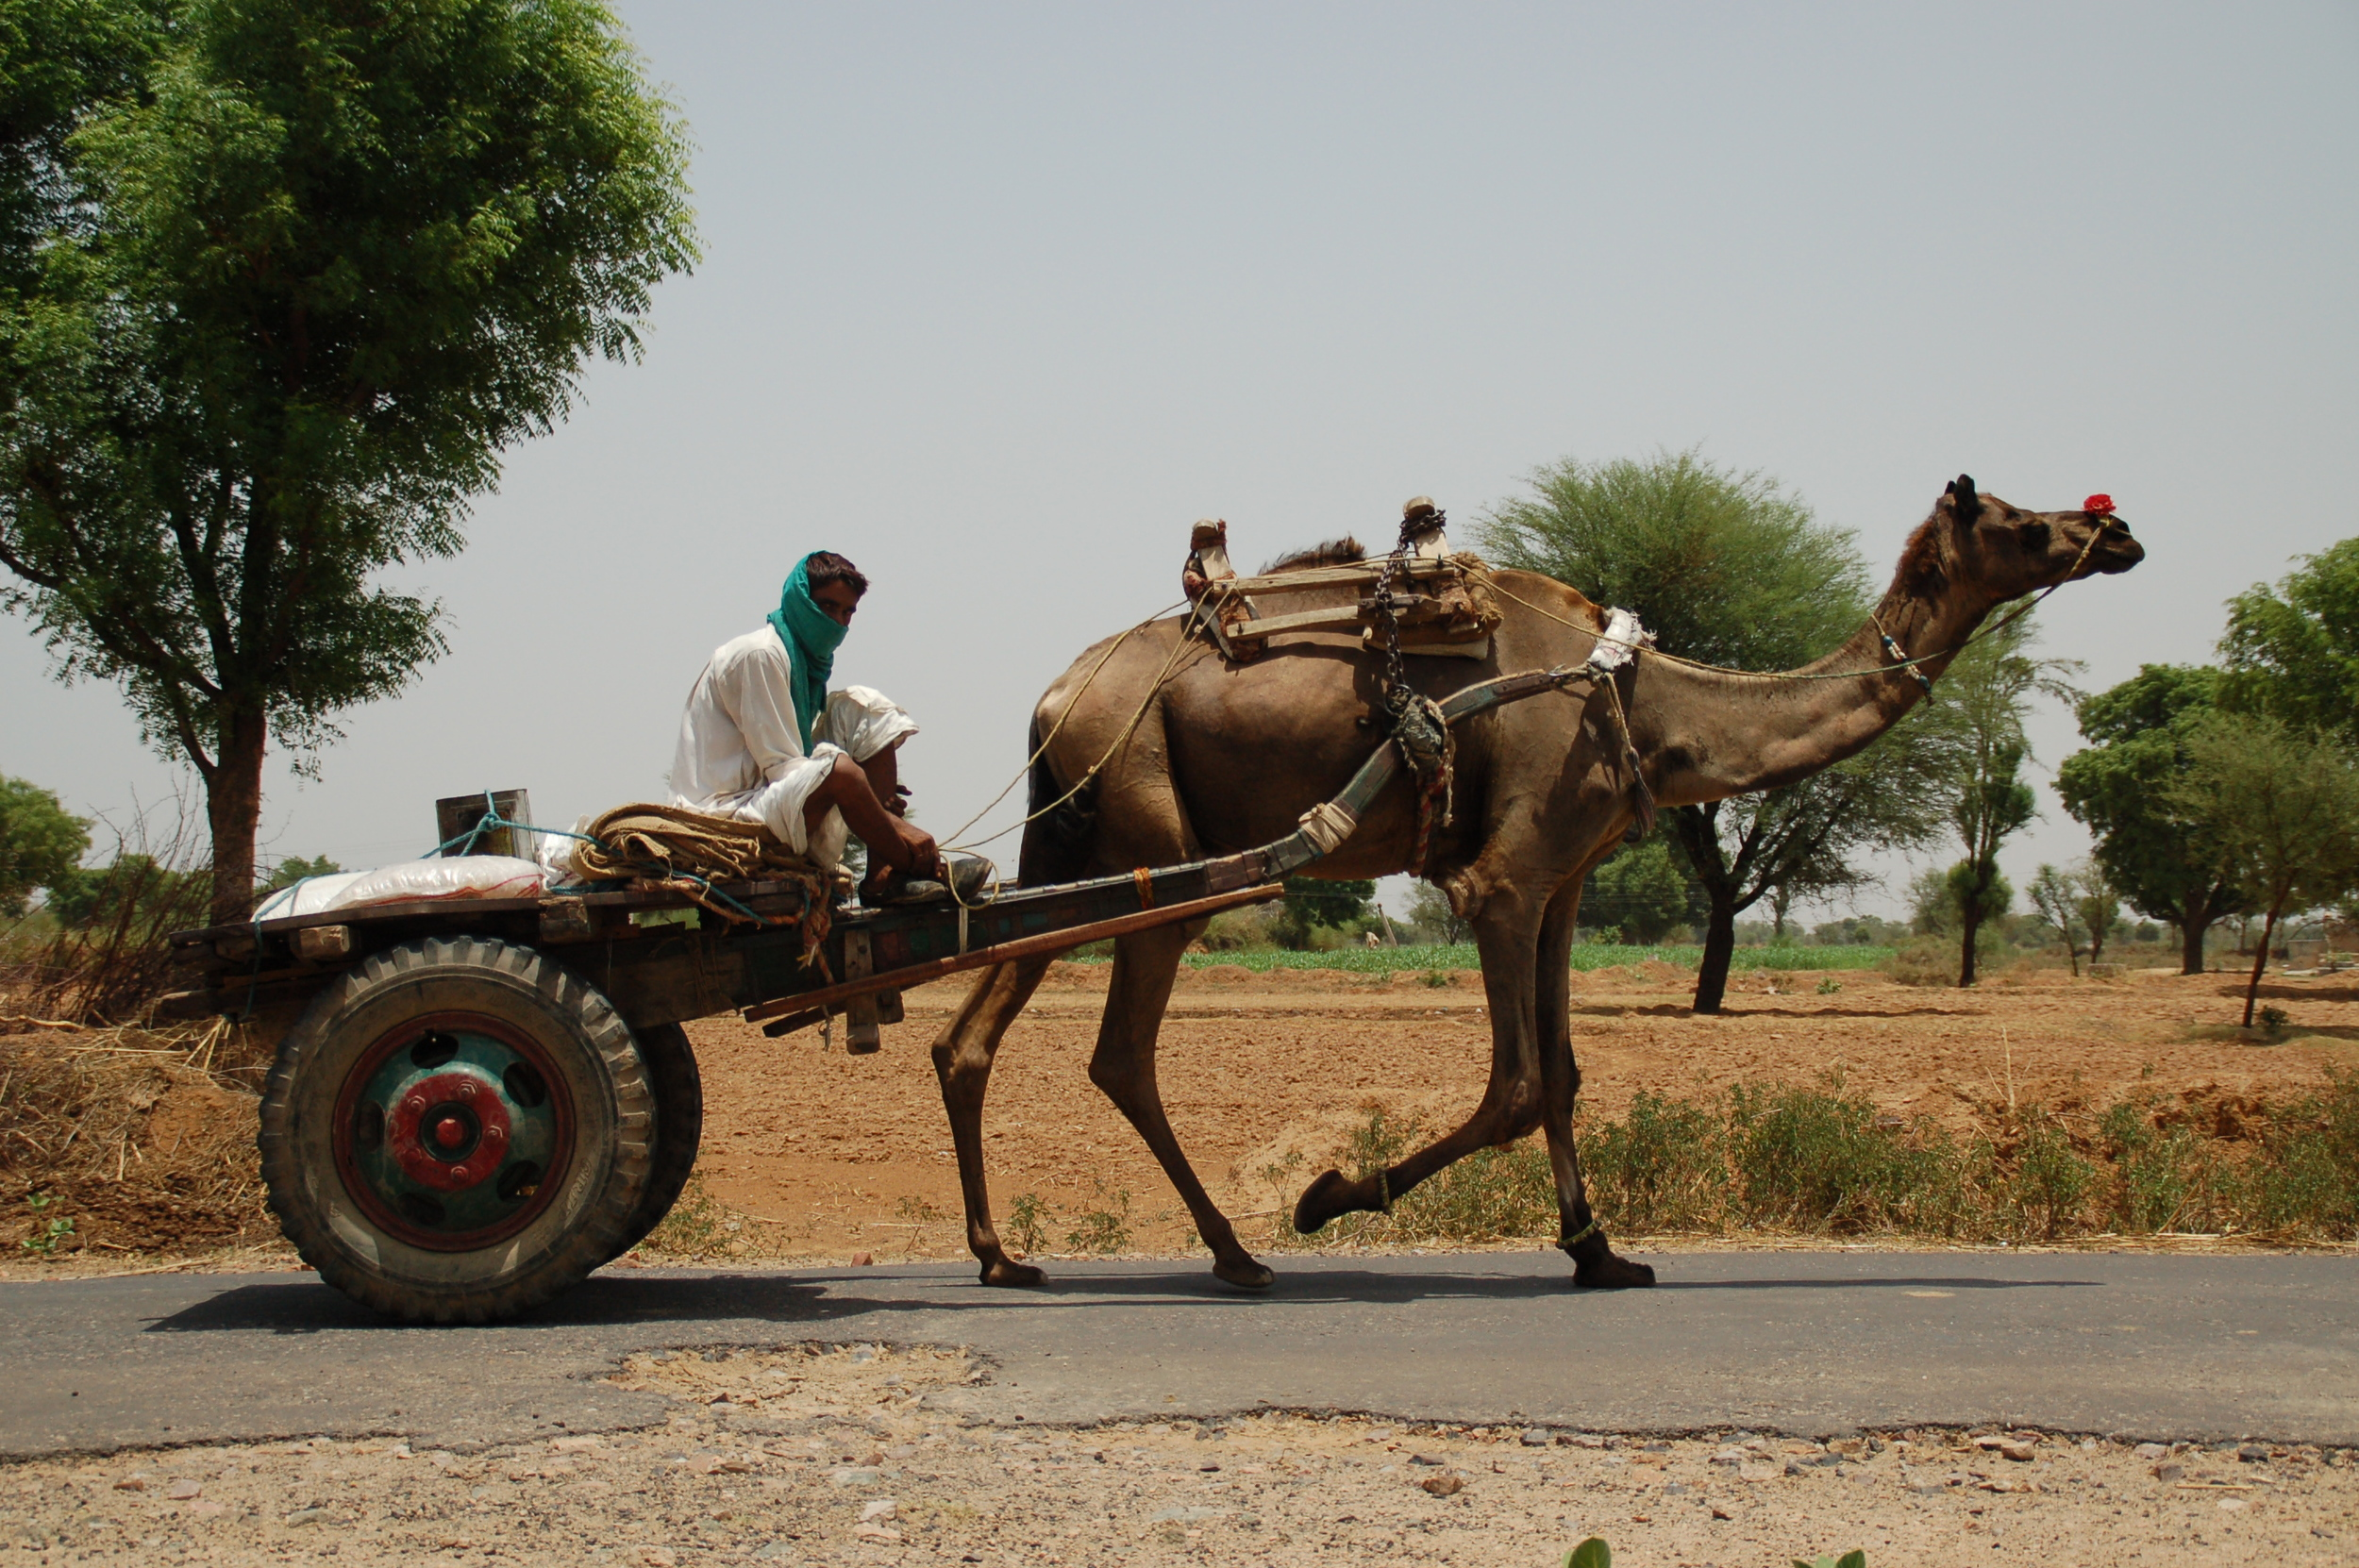 Camel Cart in Rural India